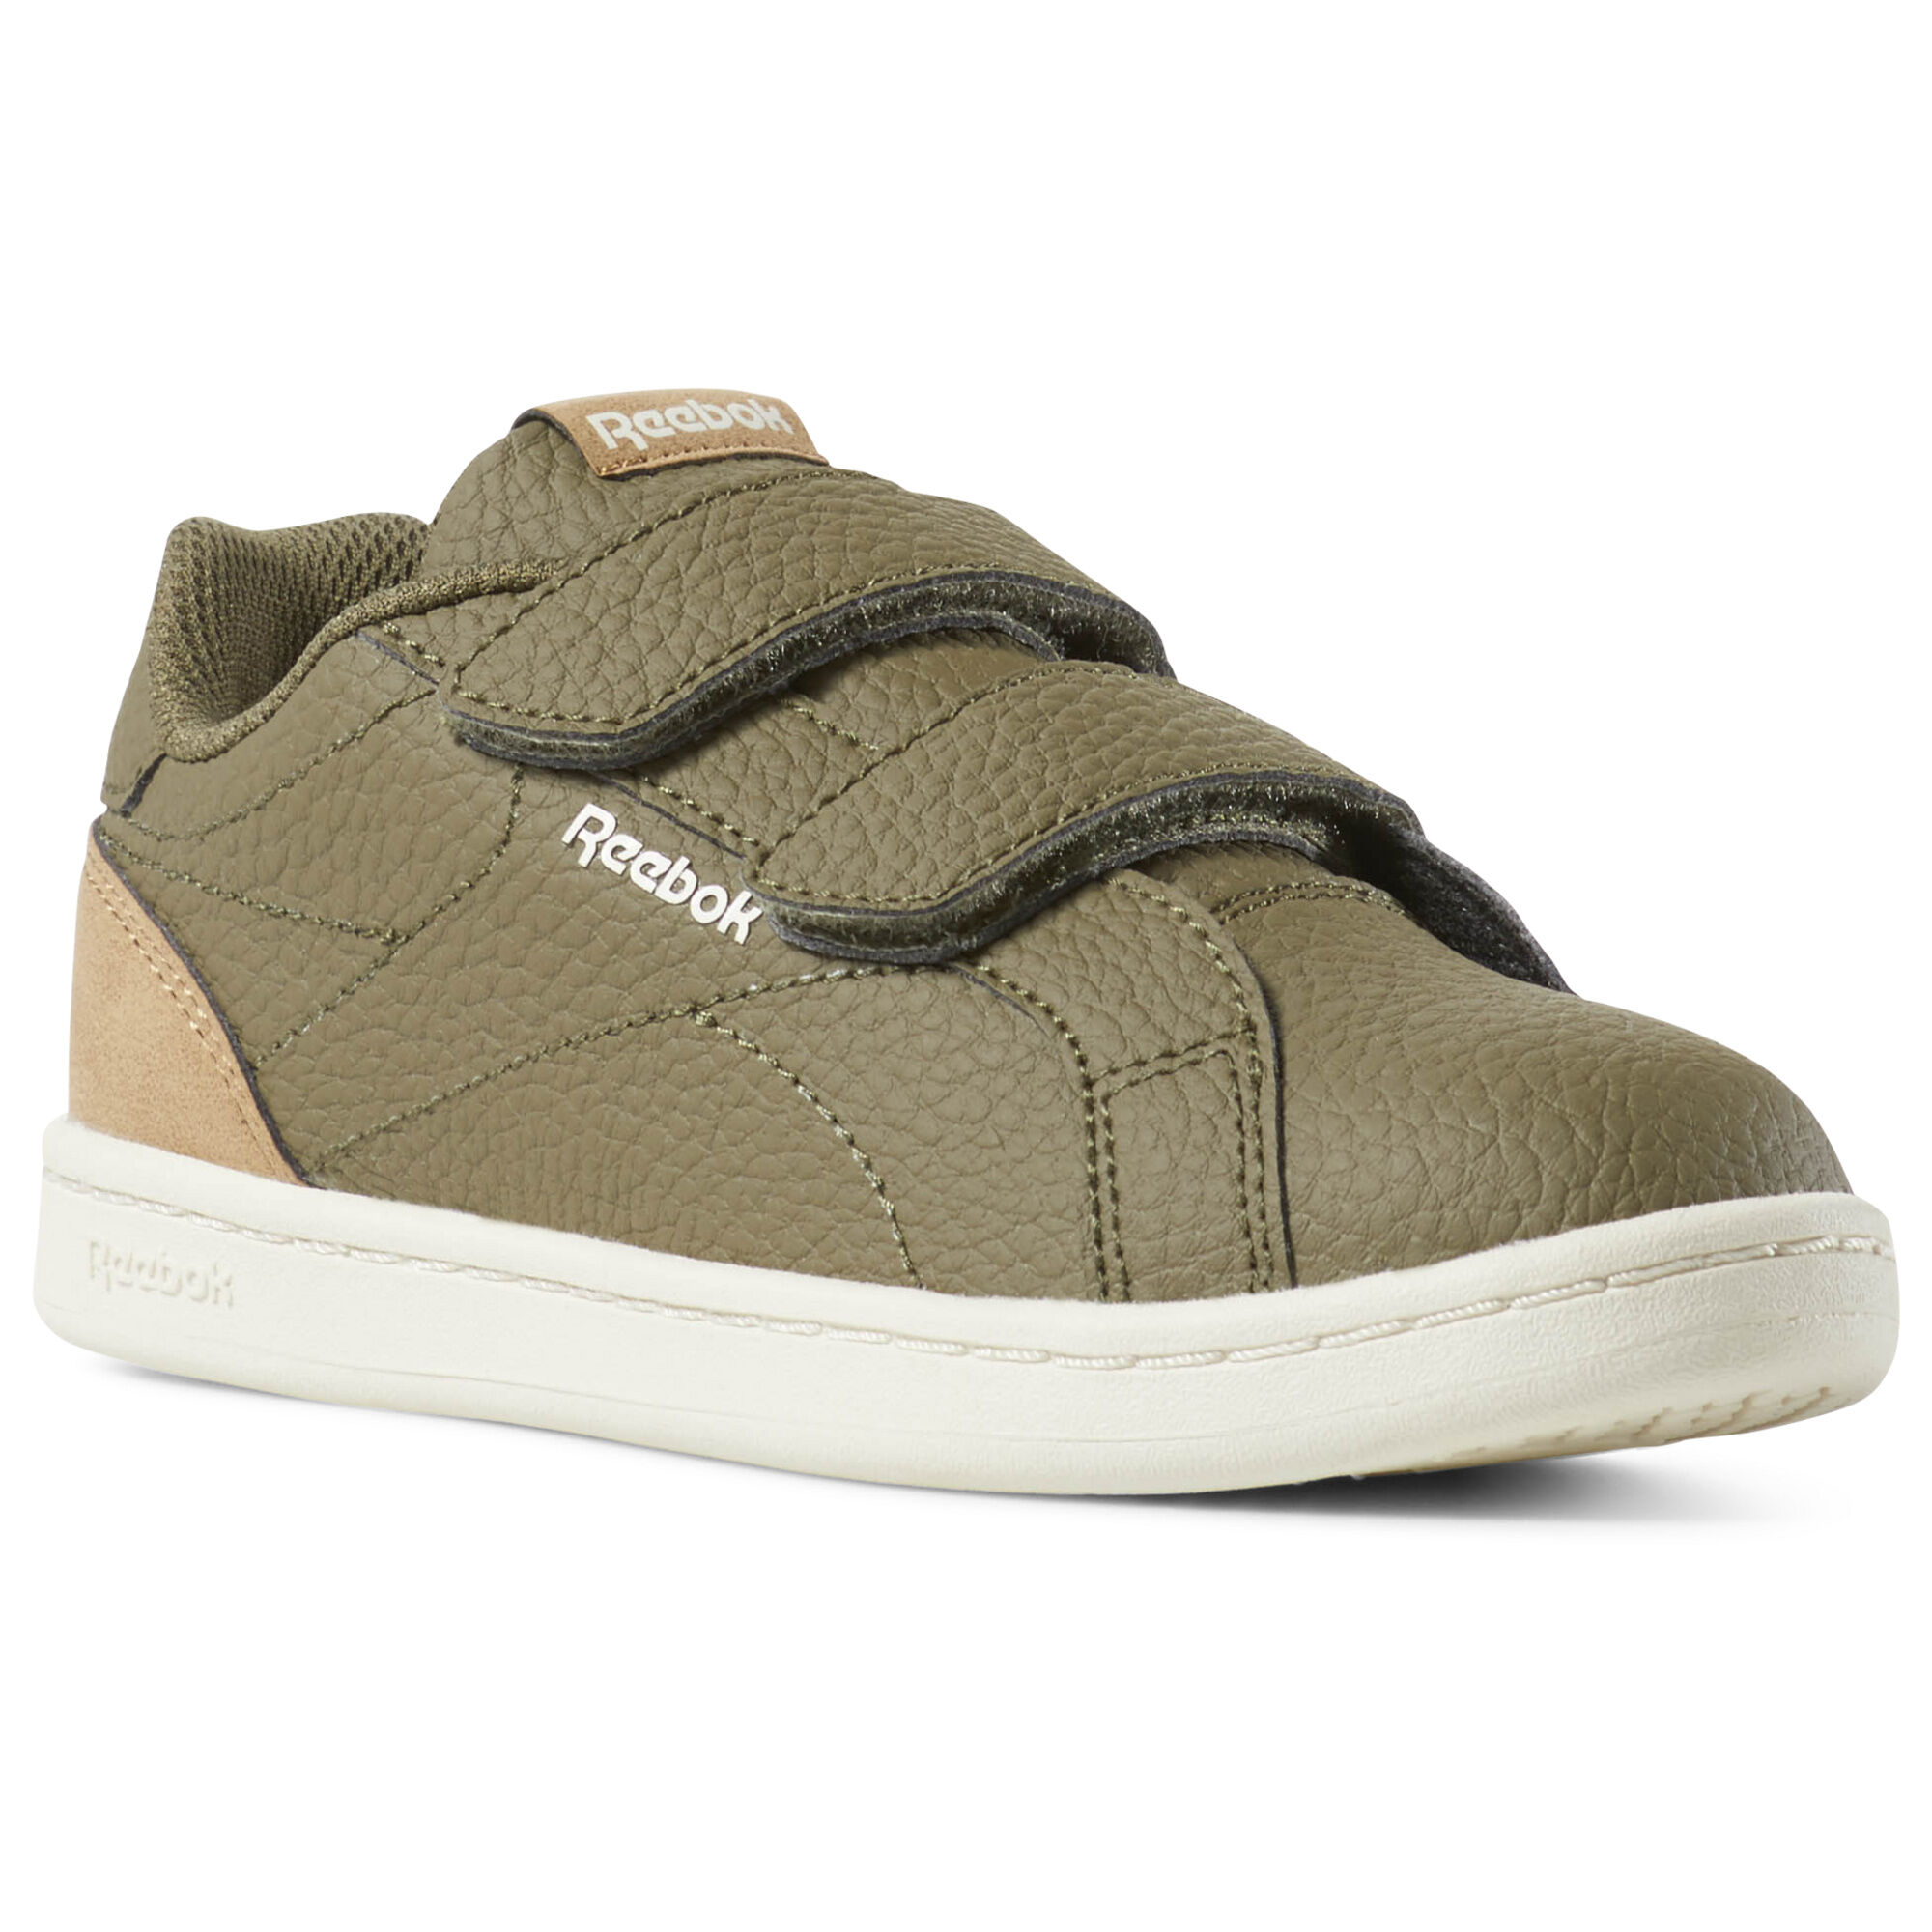 a4a2f494bdf ... 2018 shoes 34602 34193  Reebok Royal CLJOG 2 2V Hunter Green White True  Grey Gum DV4032 sneakers e031e 998ff  Guresu 2 Ashen Lilac Chalk Gum Rbk  Brass ...